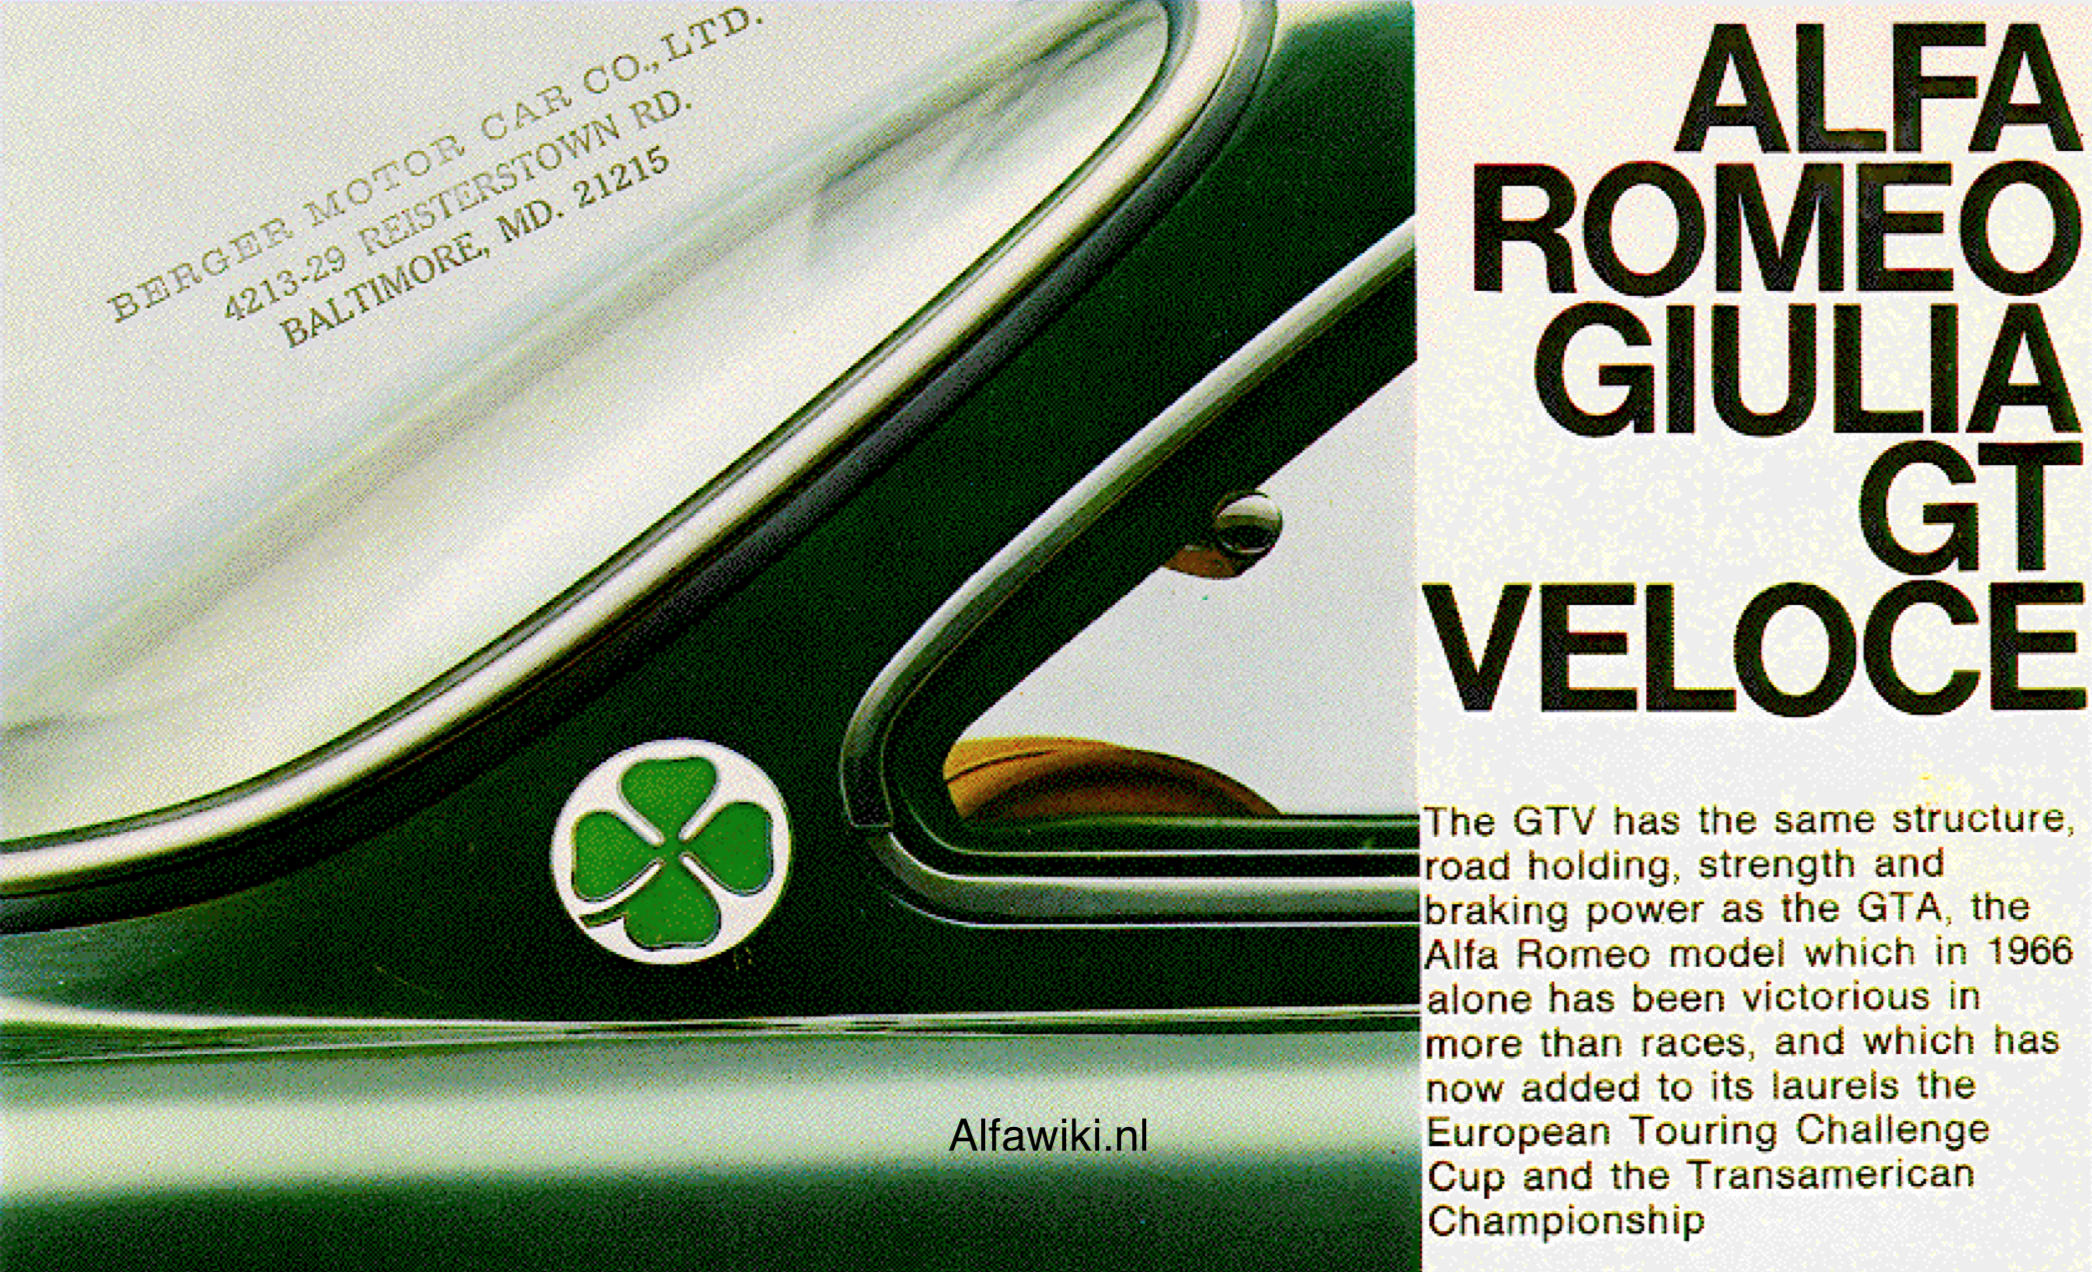 Alfa Romeo Giulia GT Veloce brochure